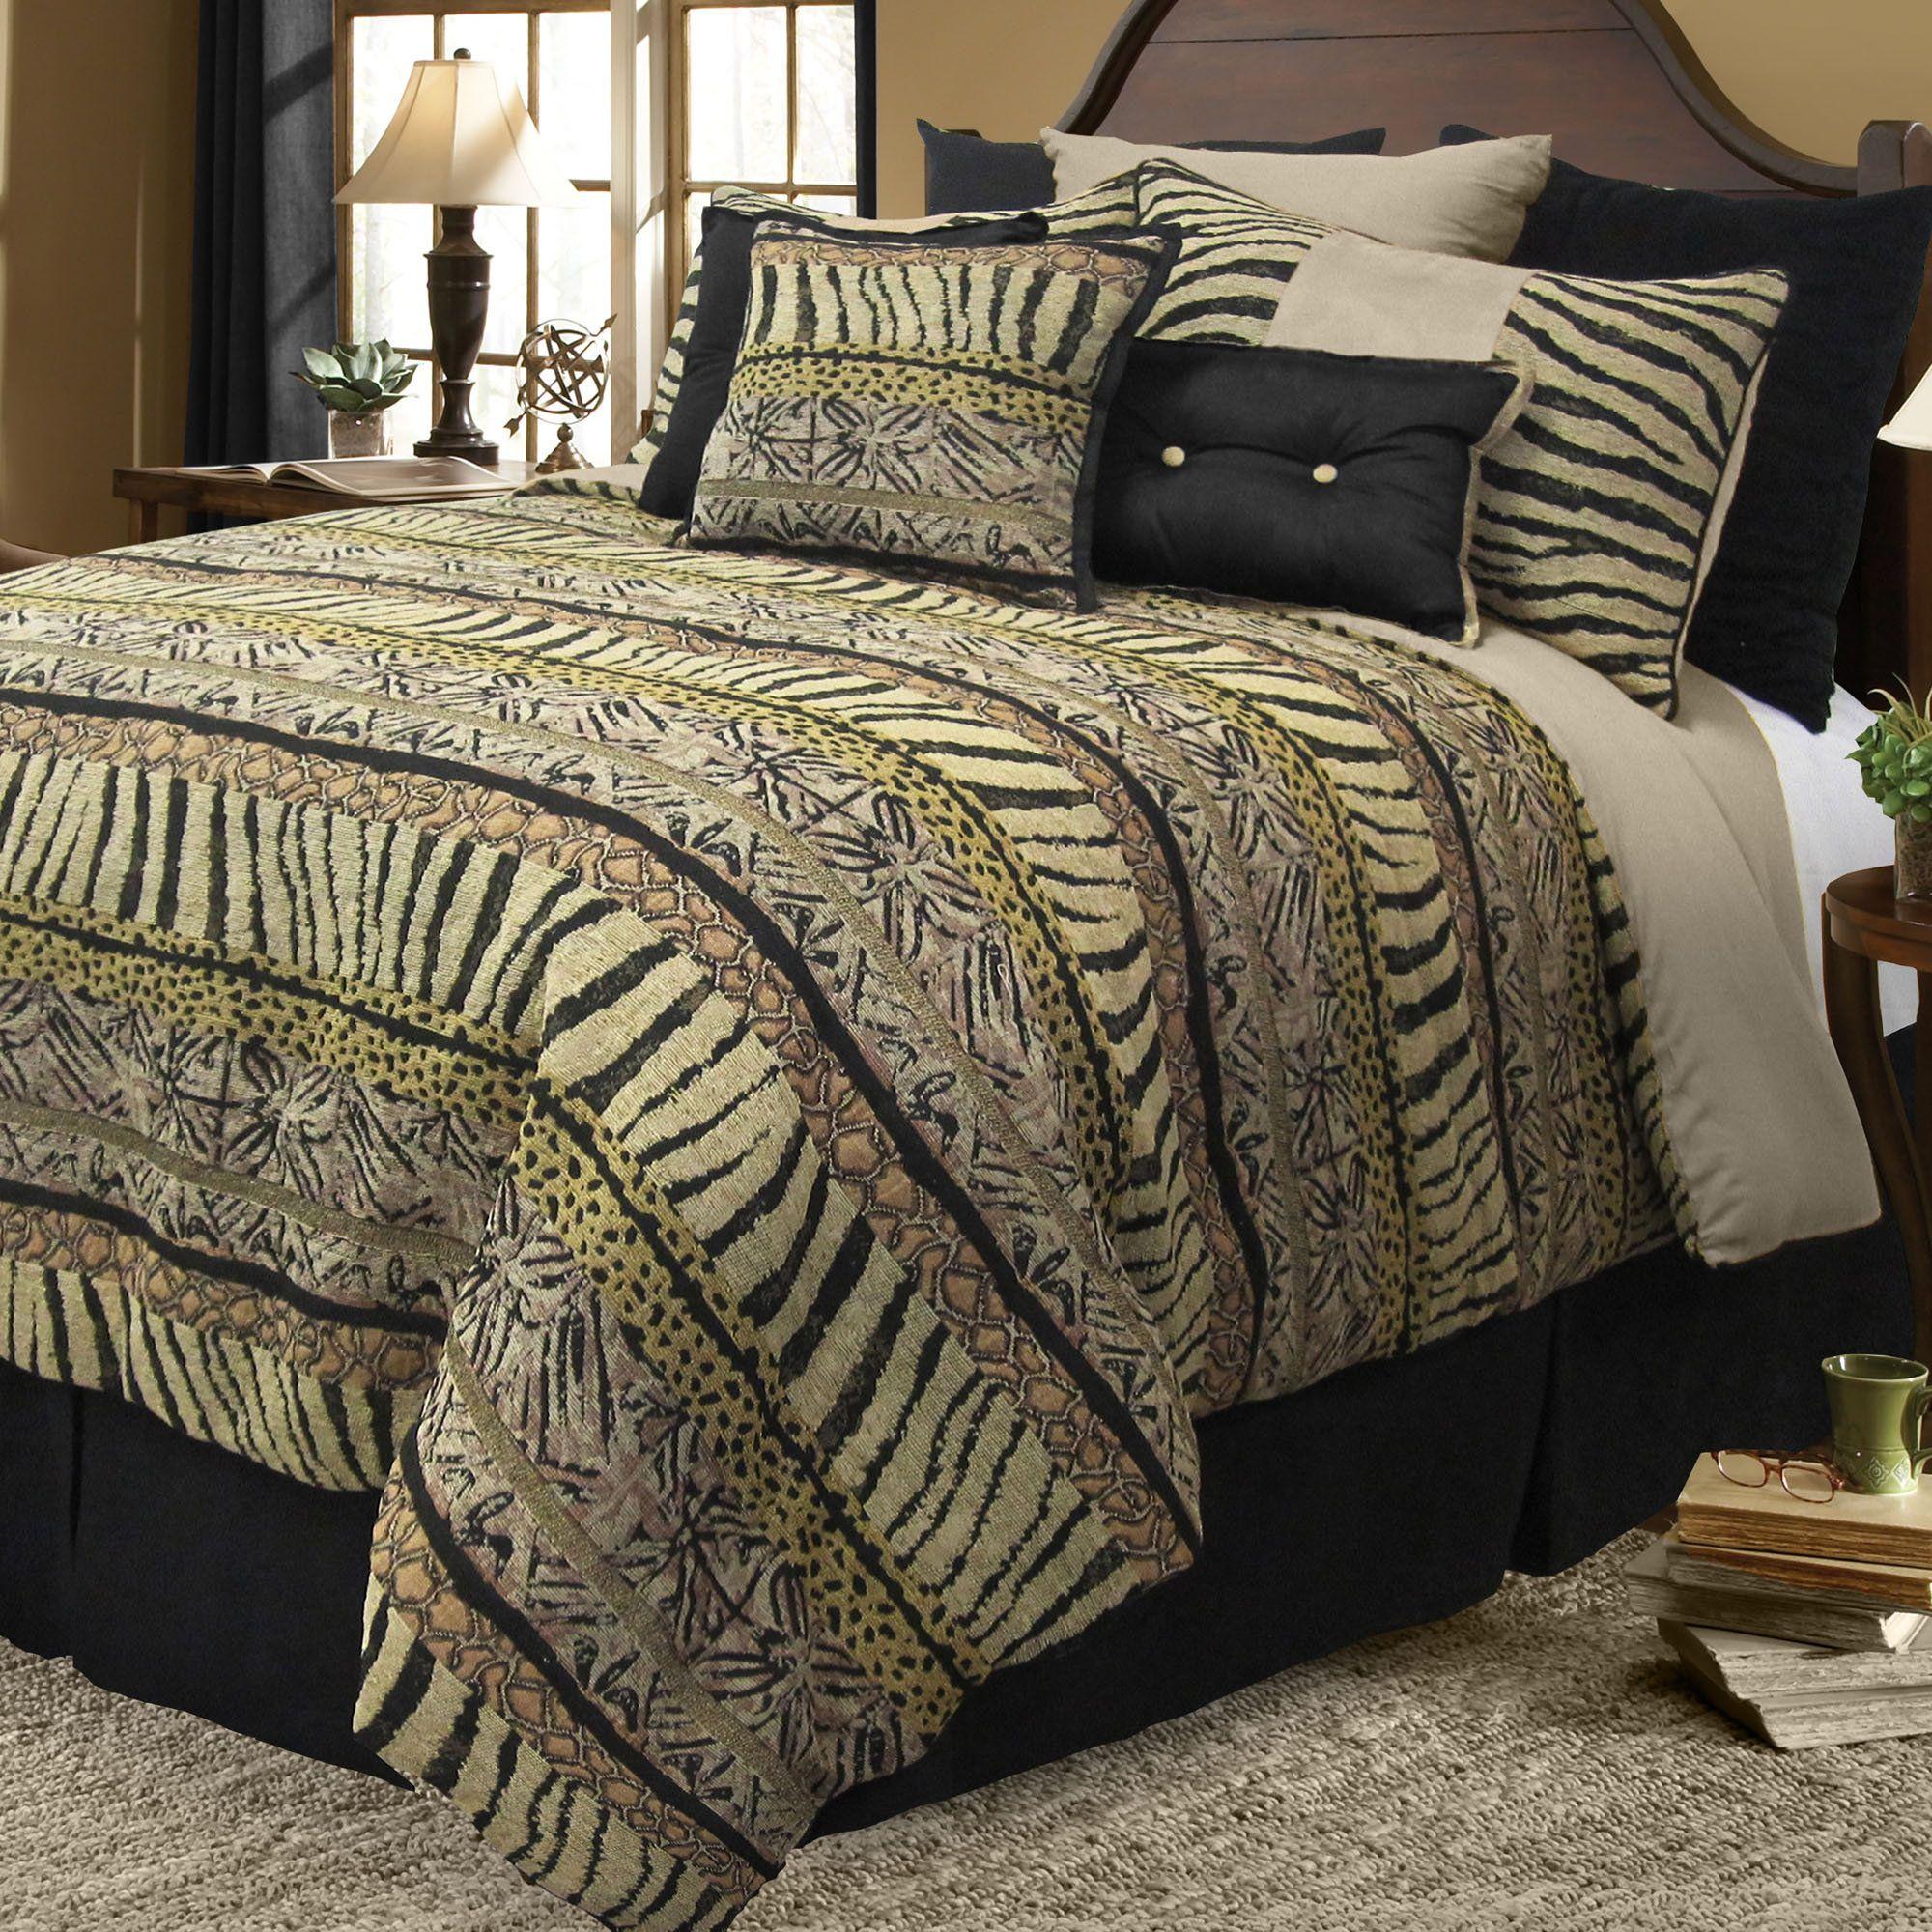 Animal print bedding zebra giraffe print bedding stuff to buy pinterest - Cheetah bedspreads ...